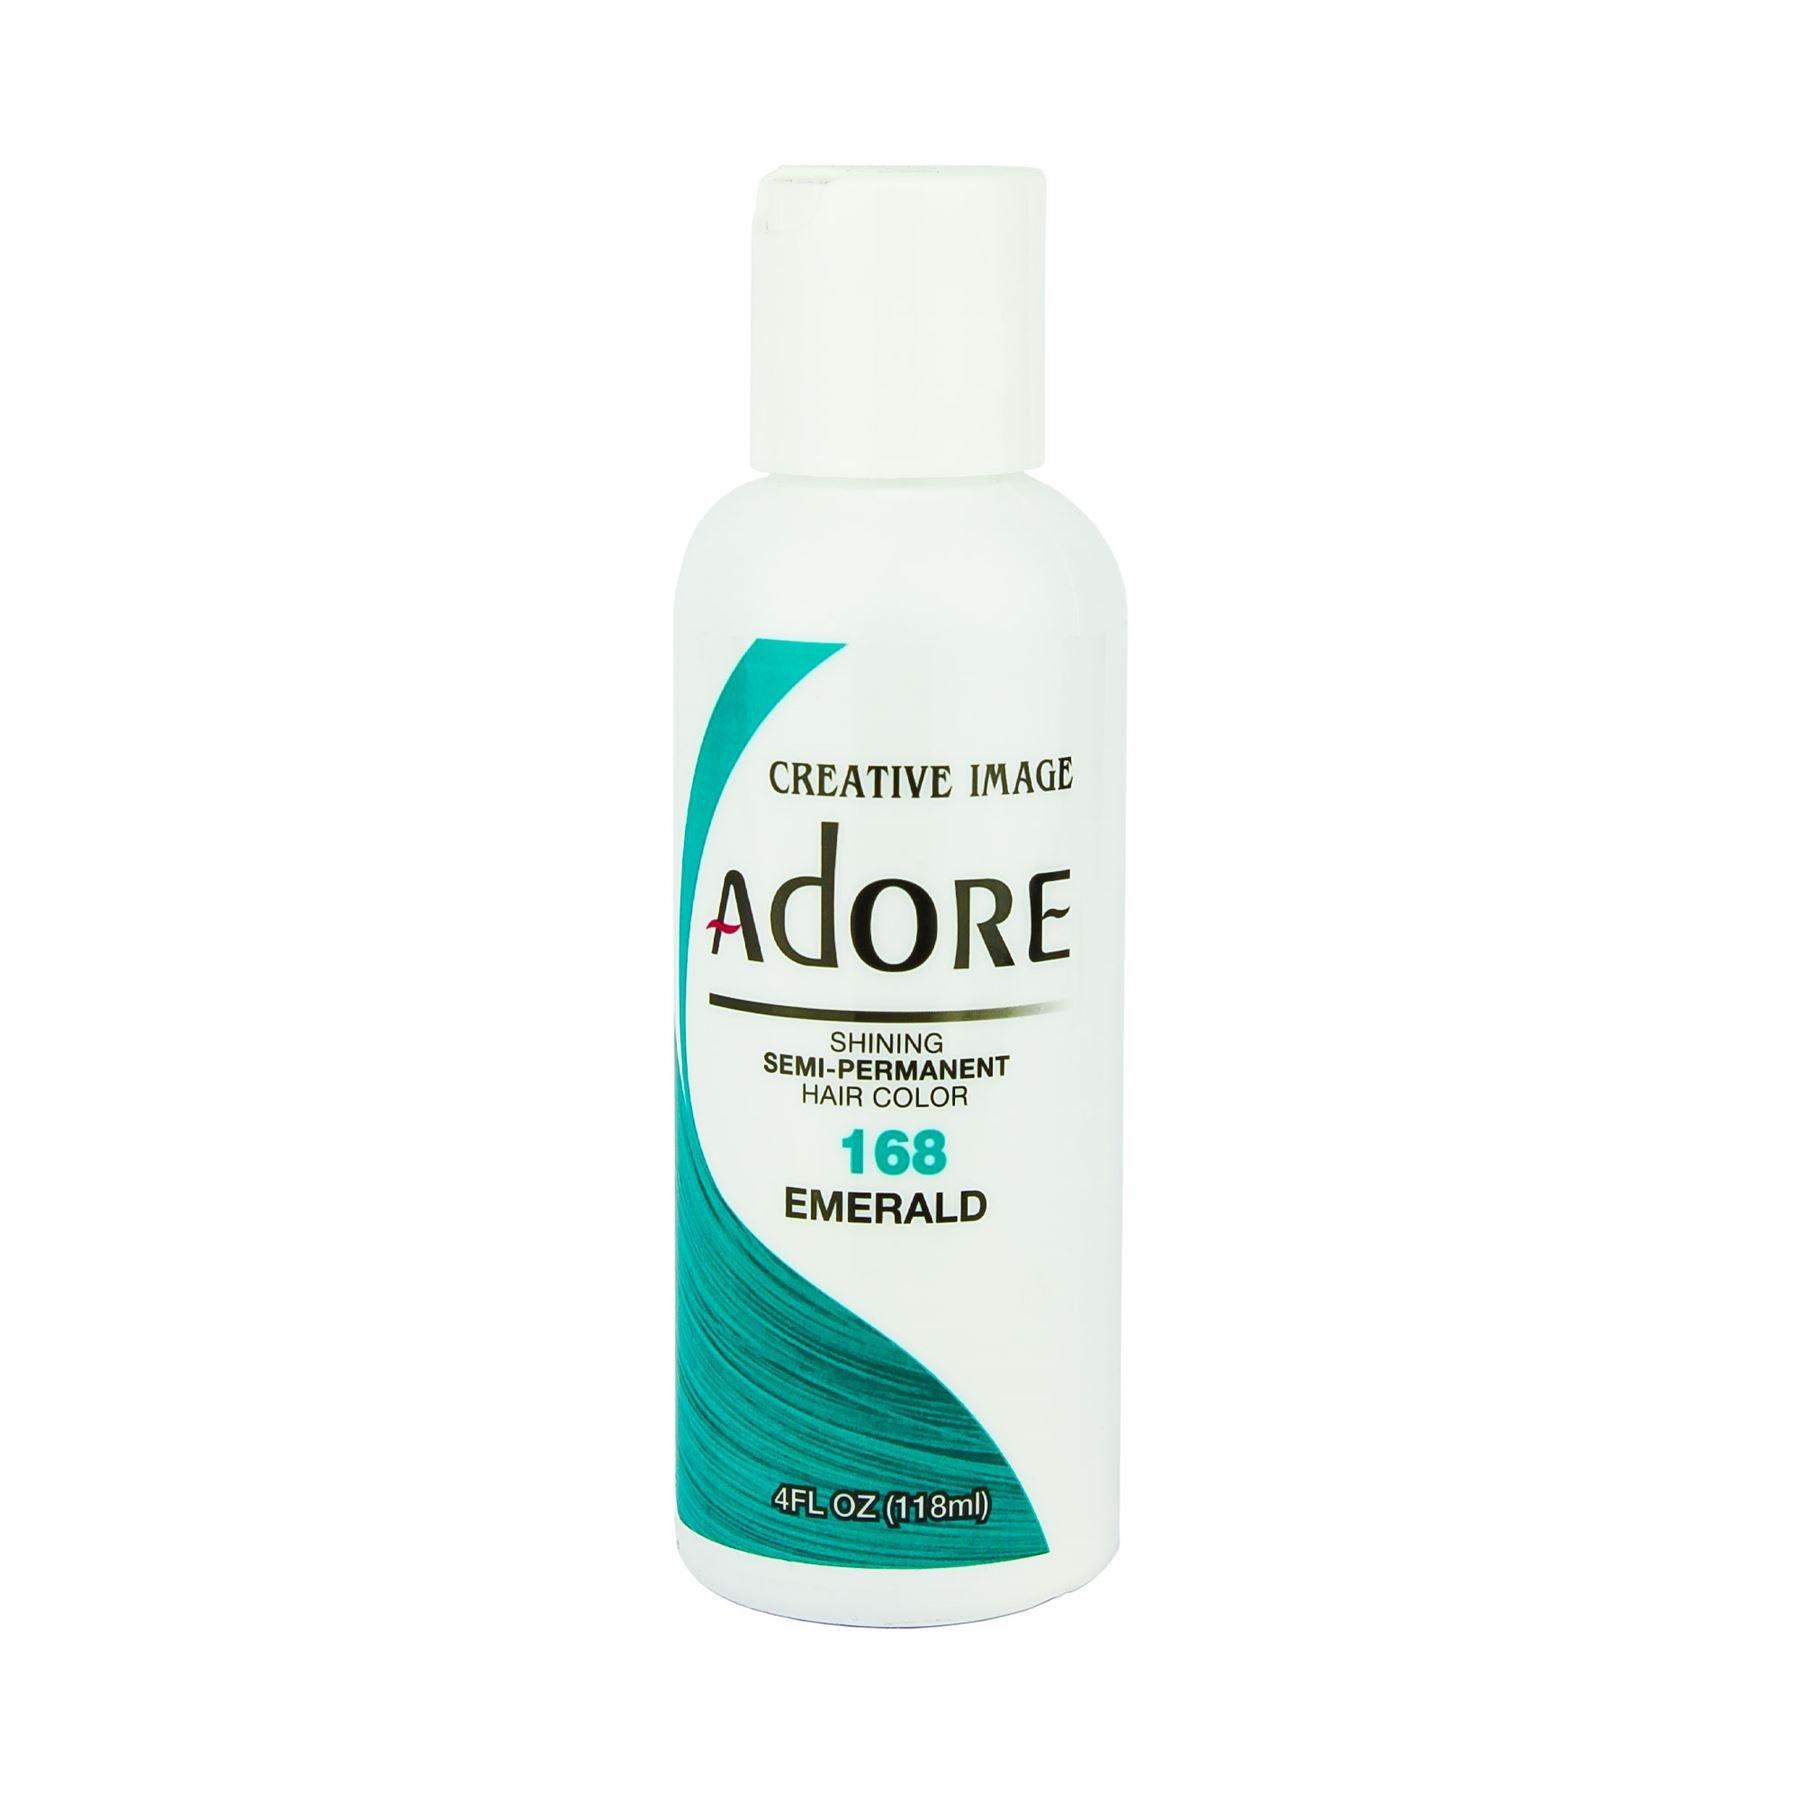 Adore Semi-Permanent Haircolor #168 Emerald 4 Ounce (118ml)